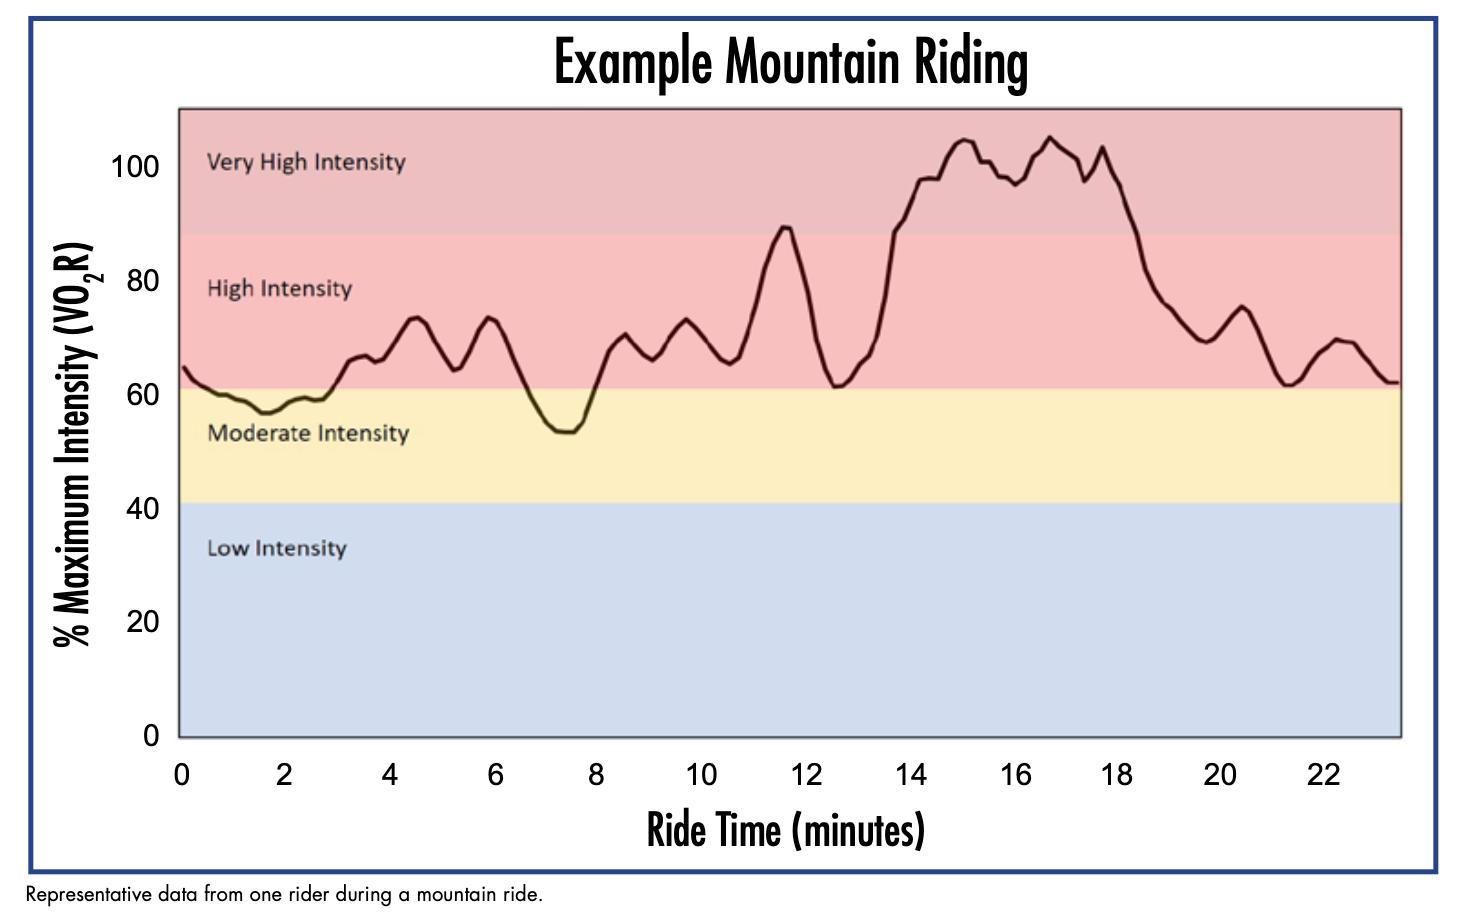 Intensity Mountain Riding